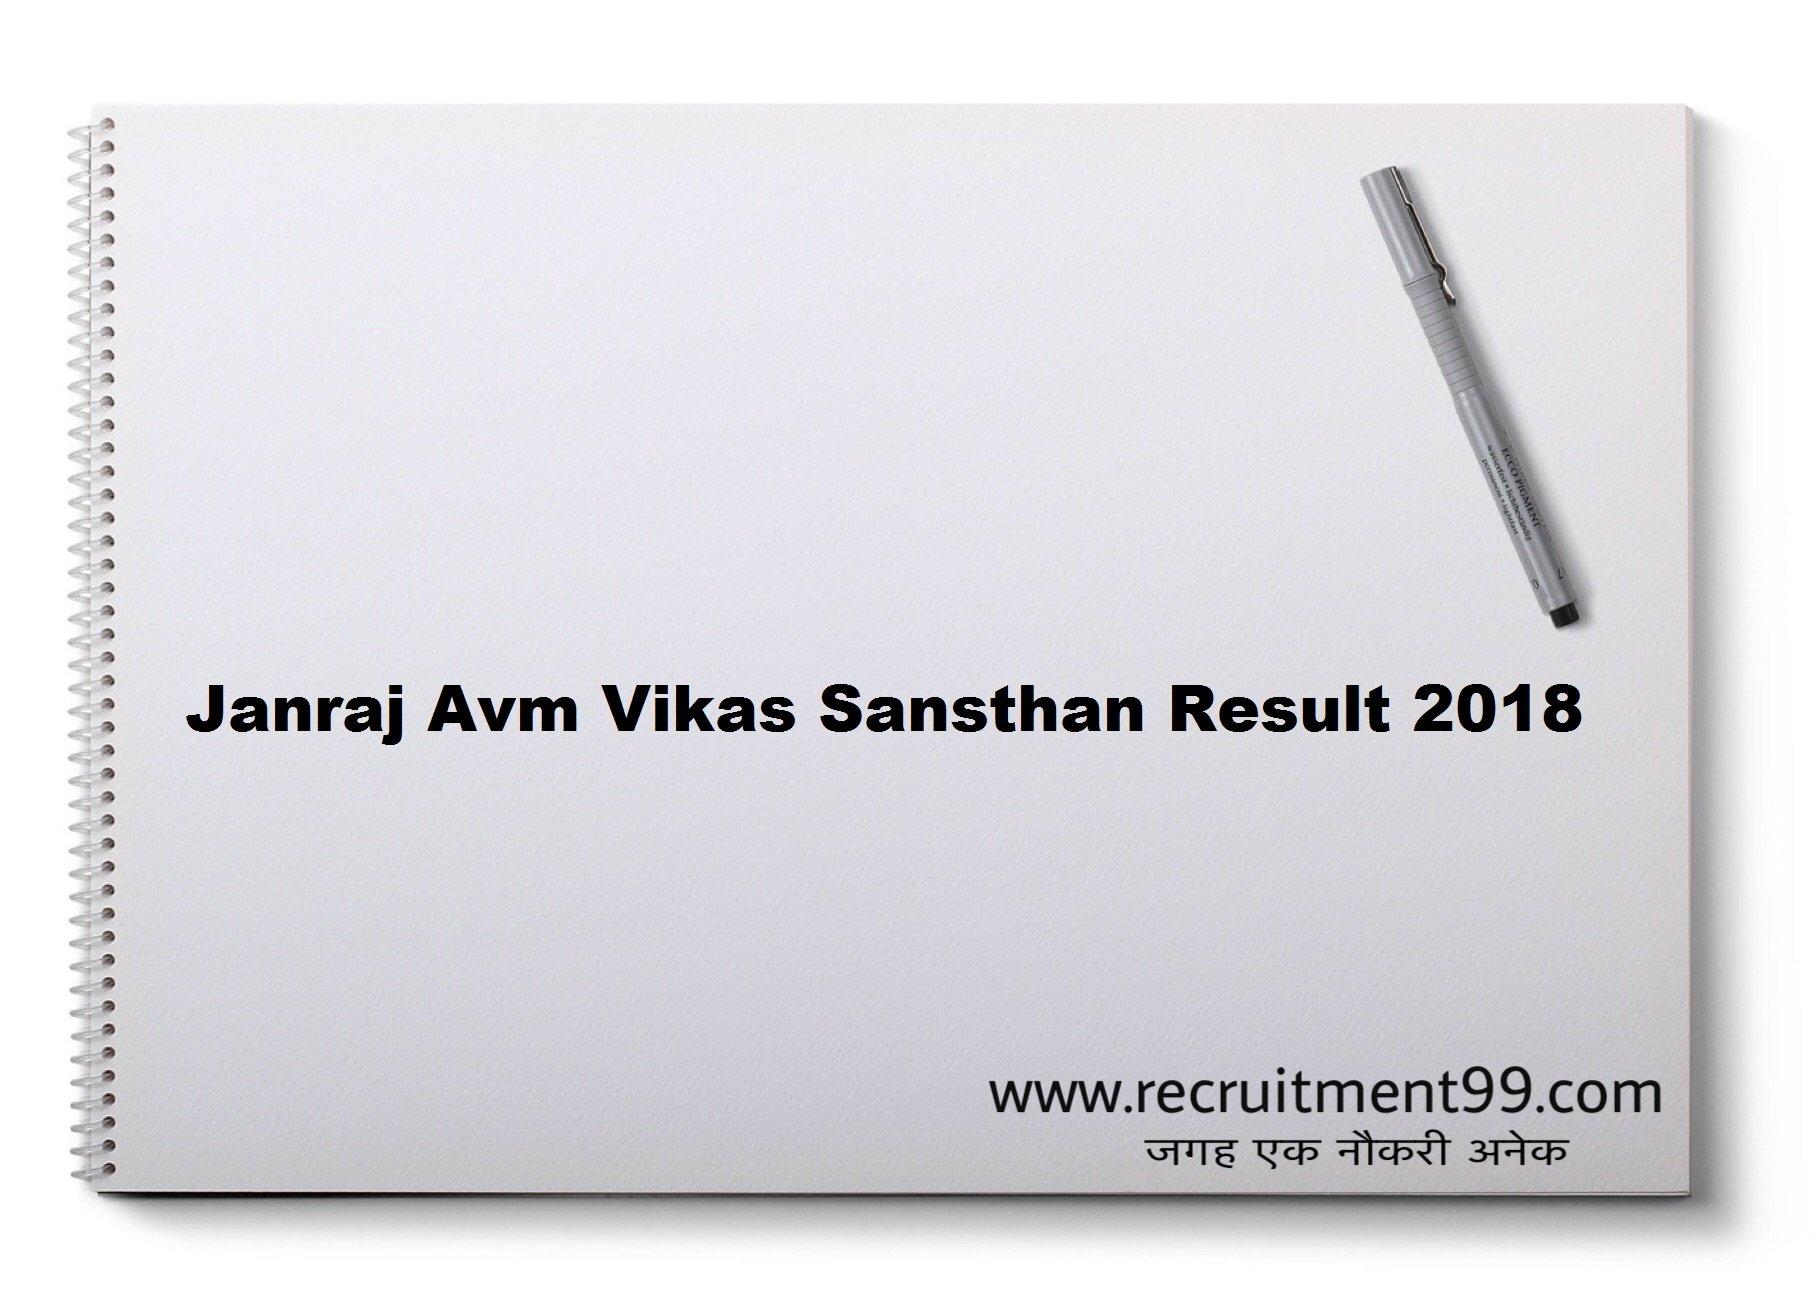 Janraj Avm Vikas Sansthan Recruitment Admit Card Result 2018